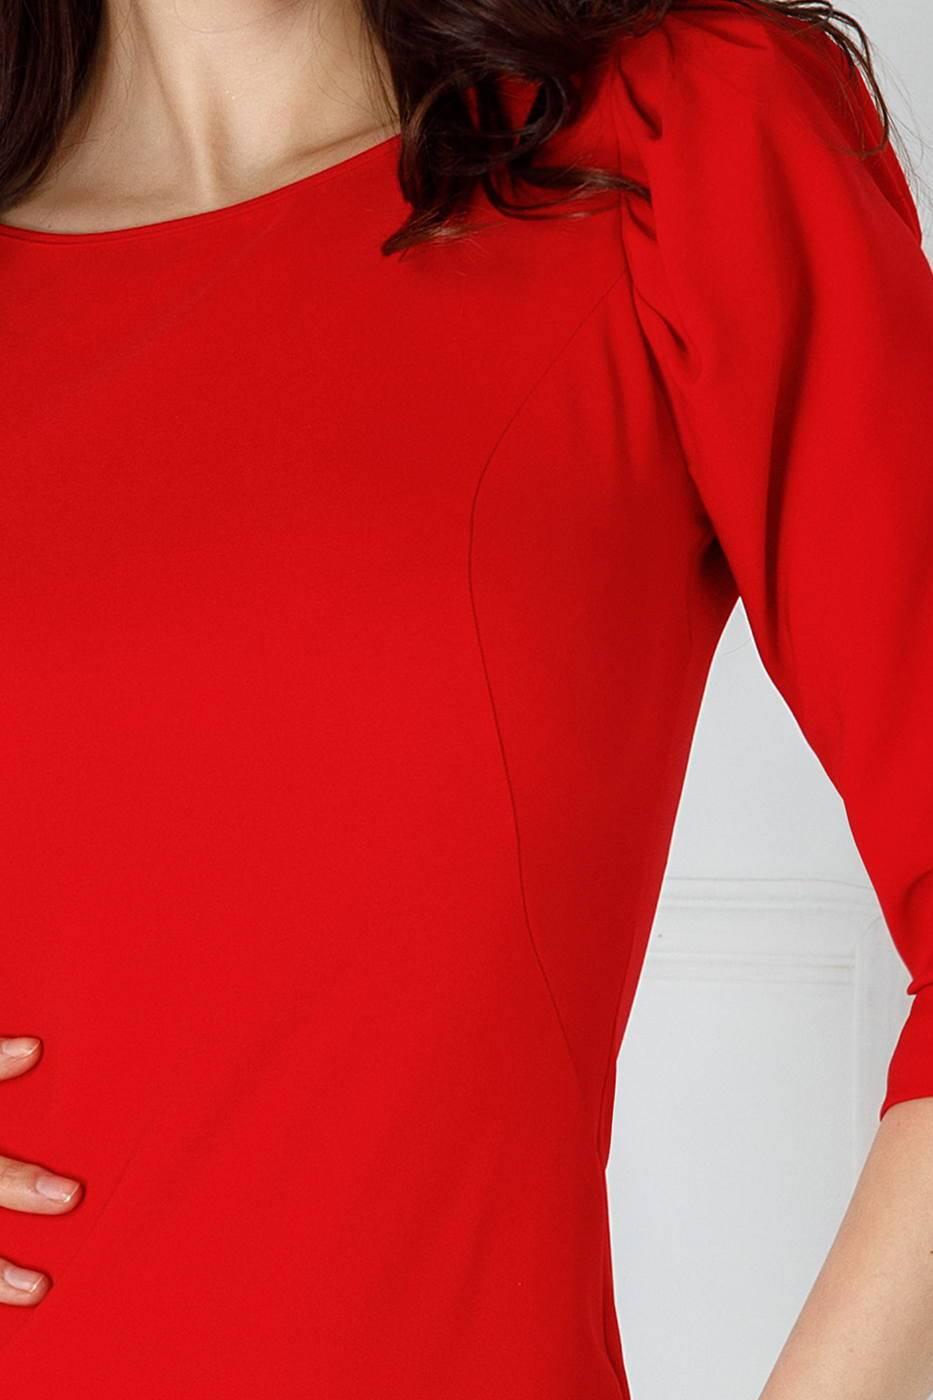 Lamia Κόκκινο Φόρεμα 2193